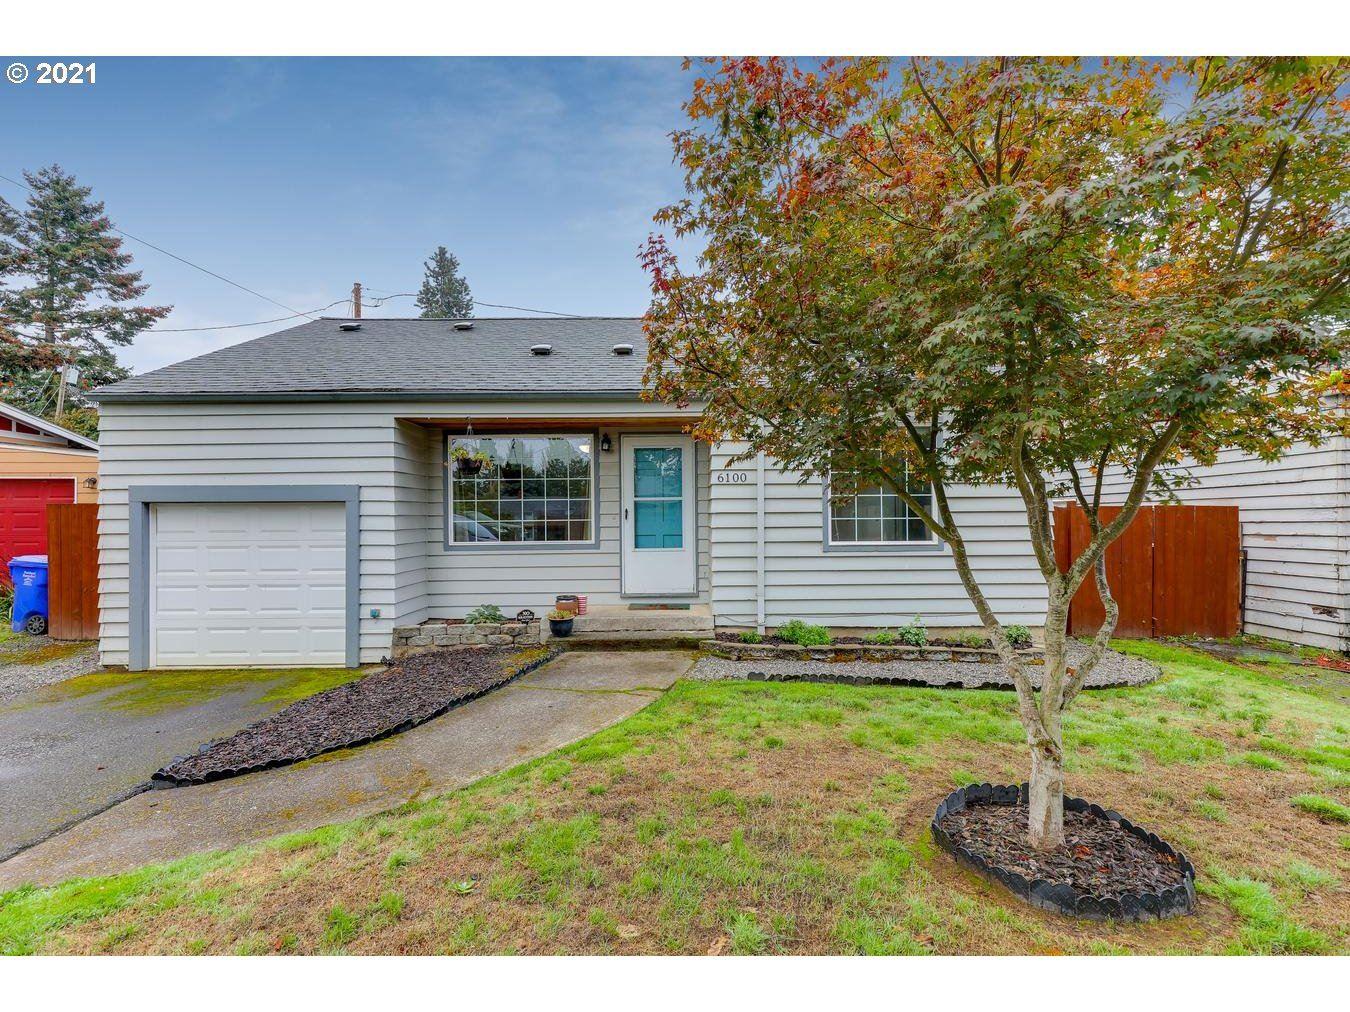 6100 NE SIMPSON ST, Portland, OR 97218 - MLS#: 21182152